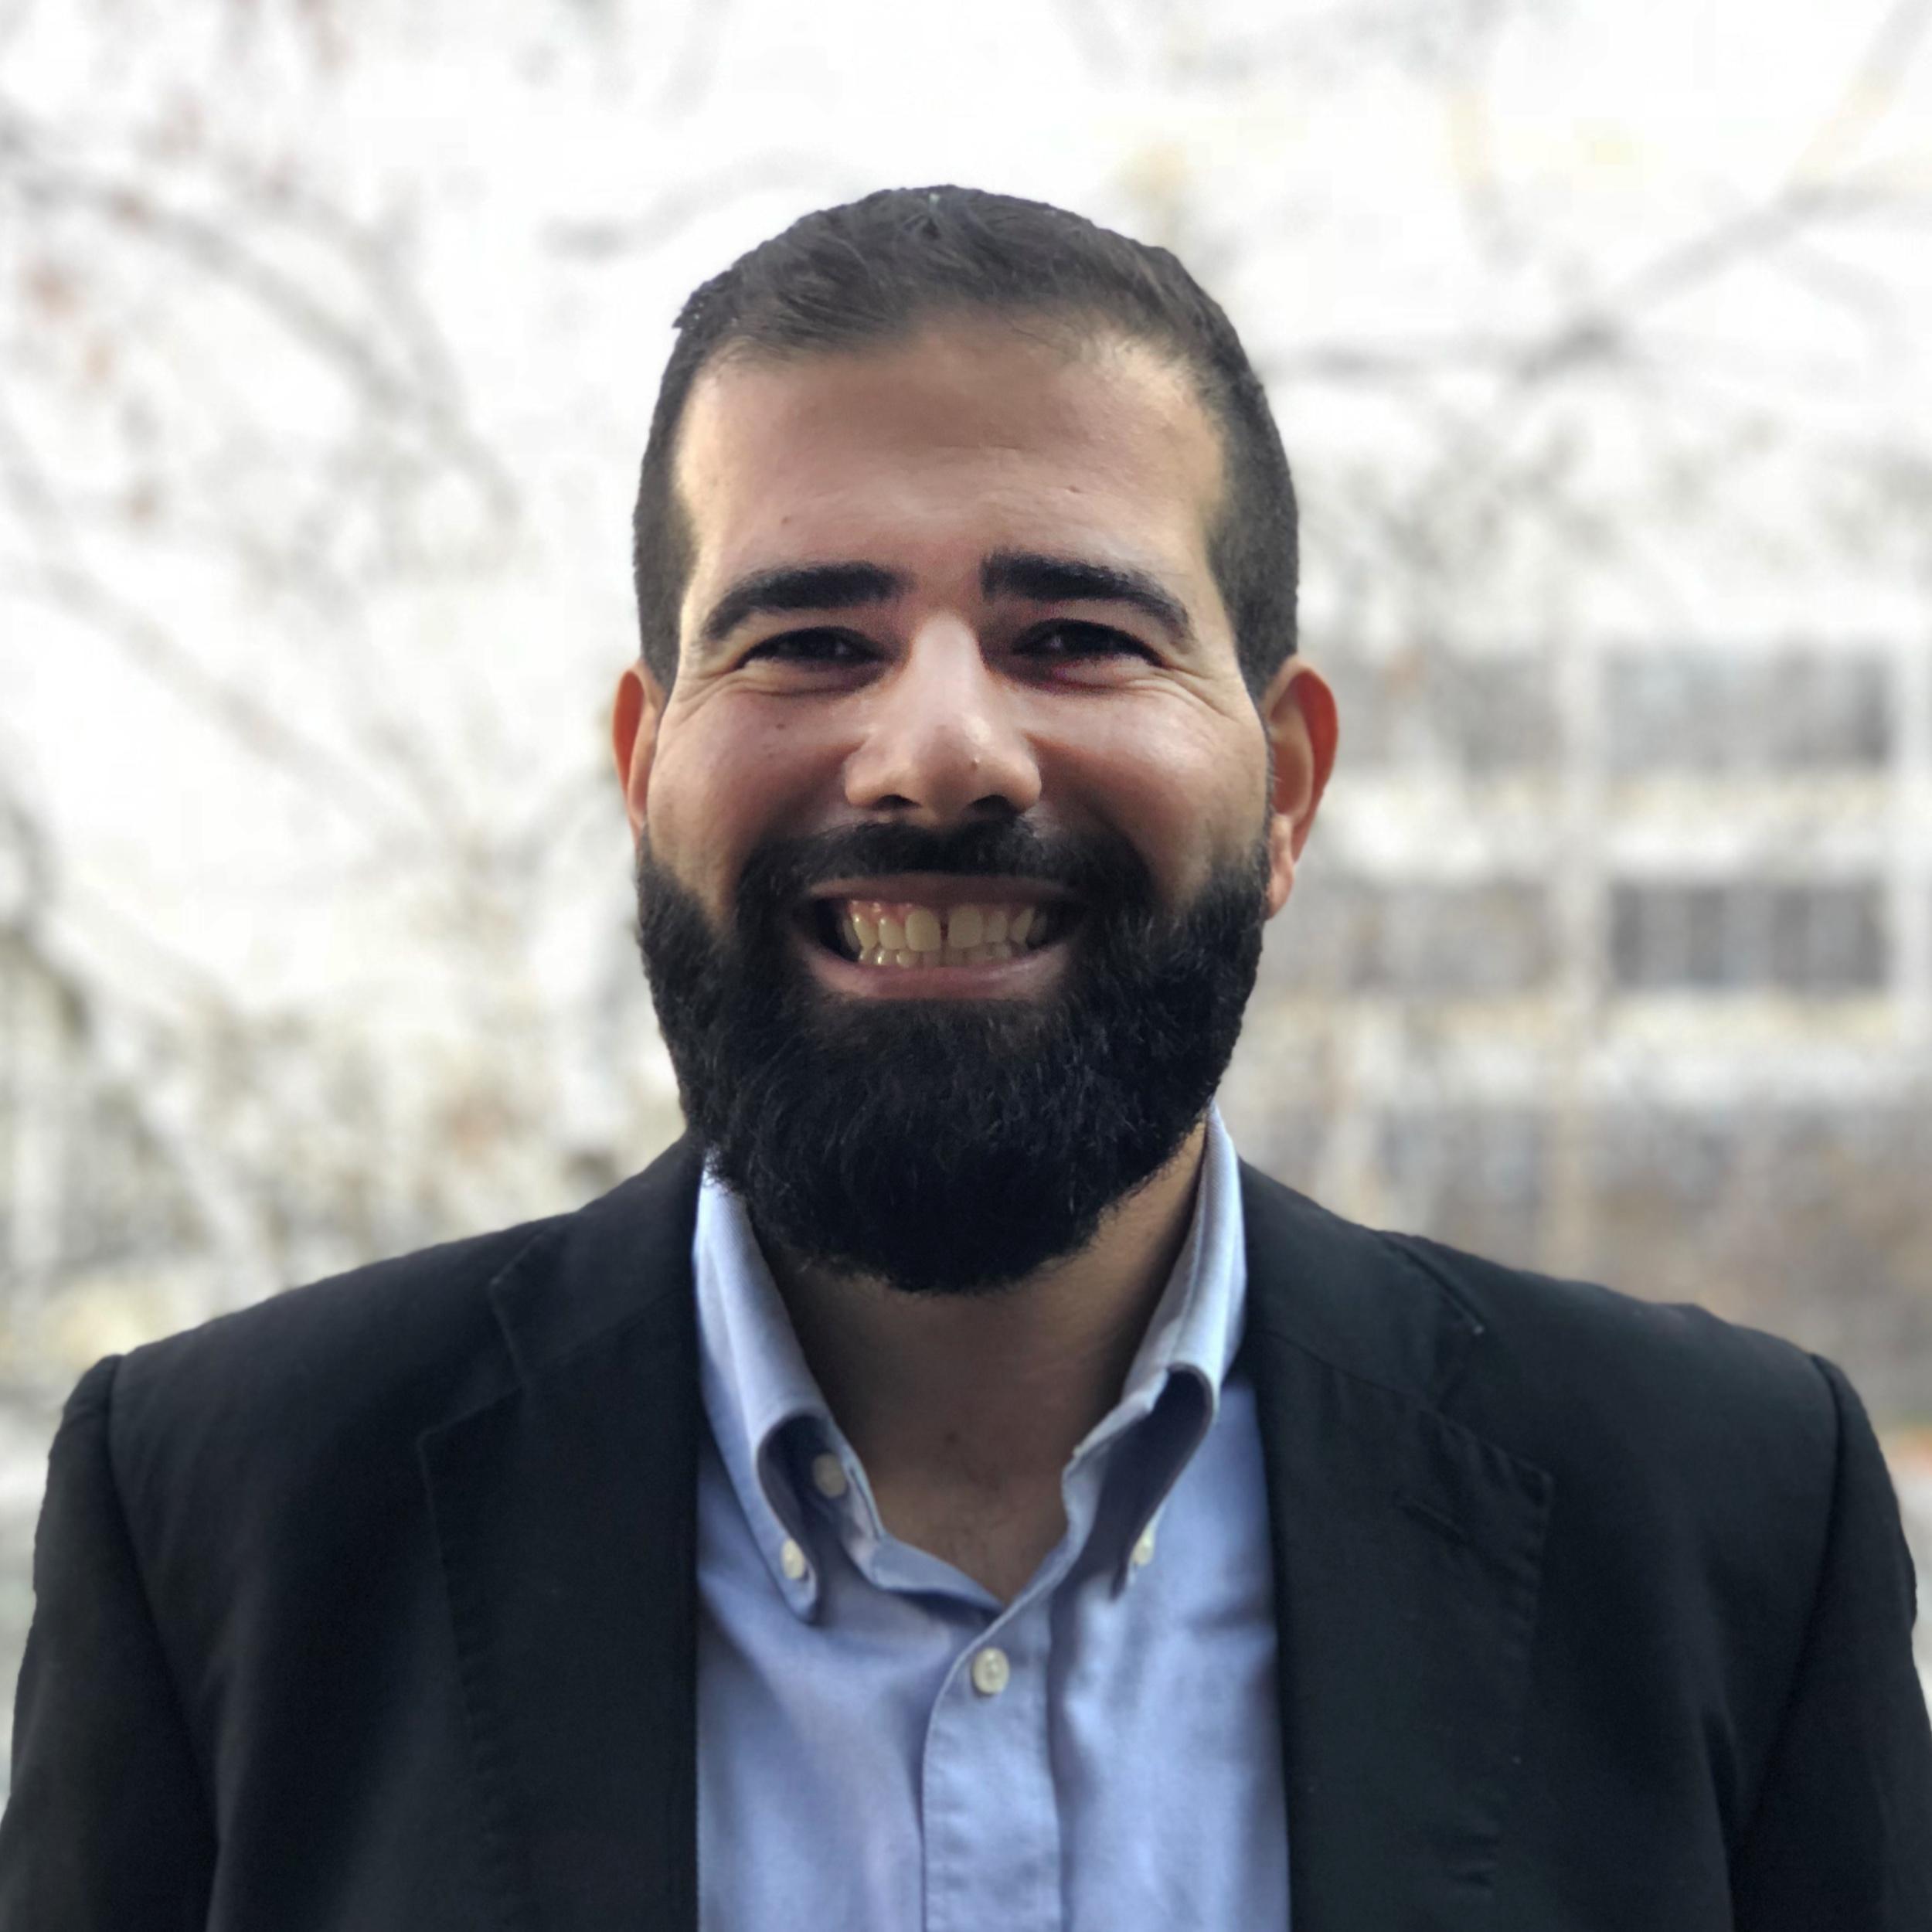 Abdelrahman Awad, MD - Clinical Subjects Coordinator